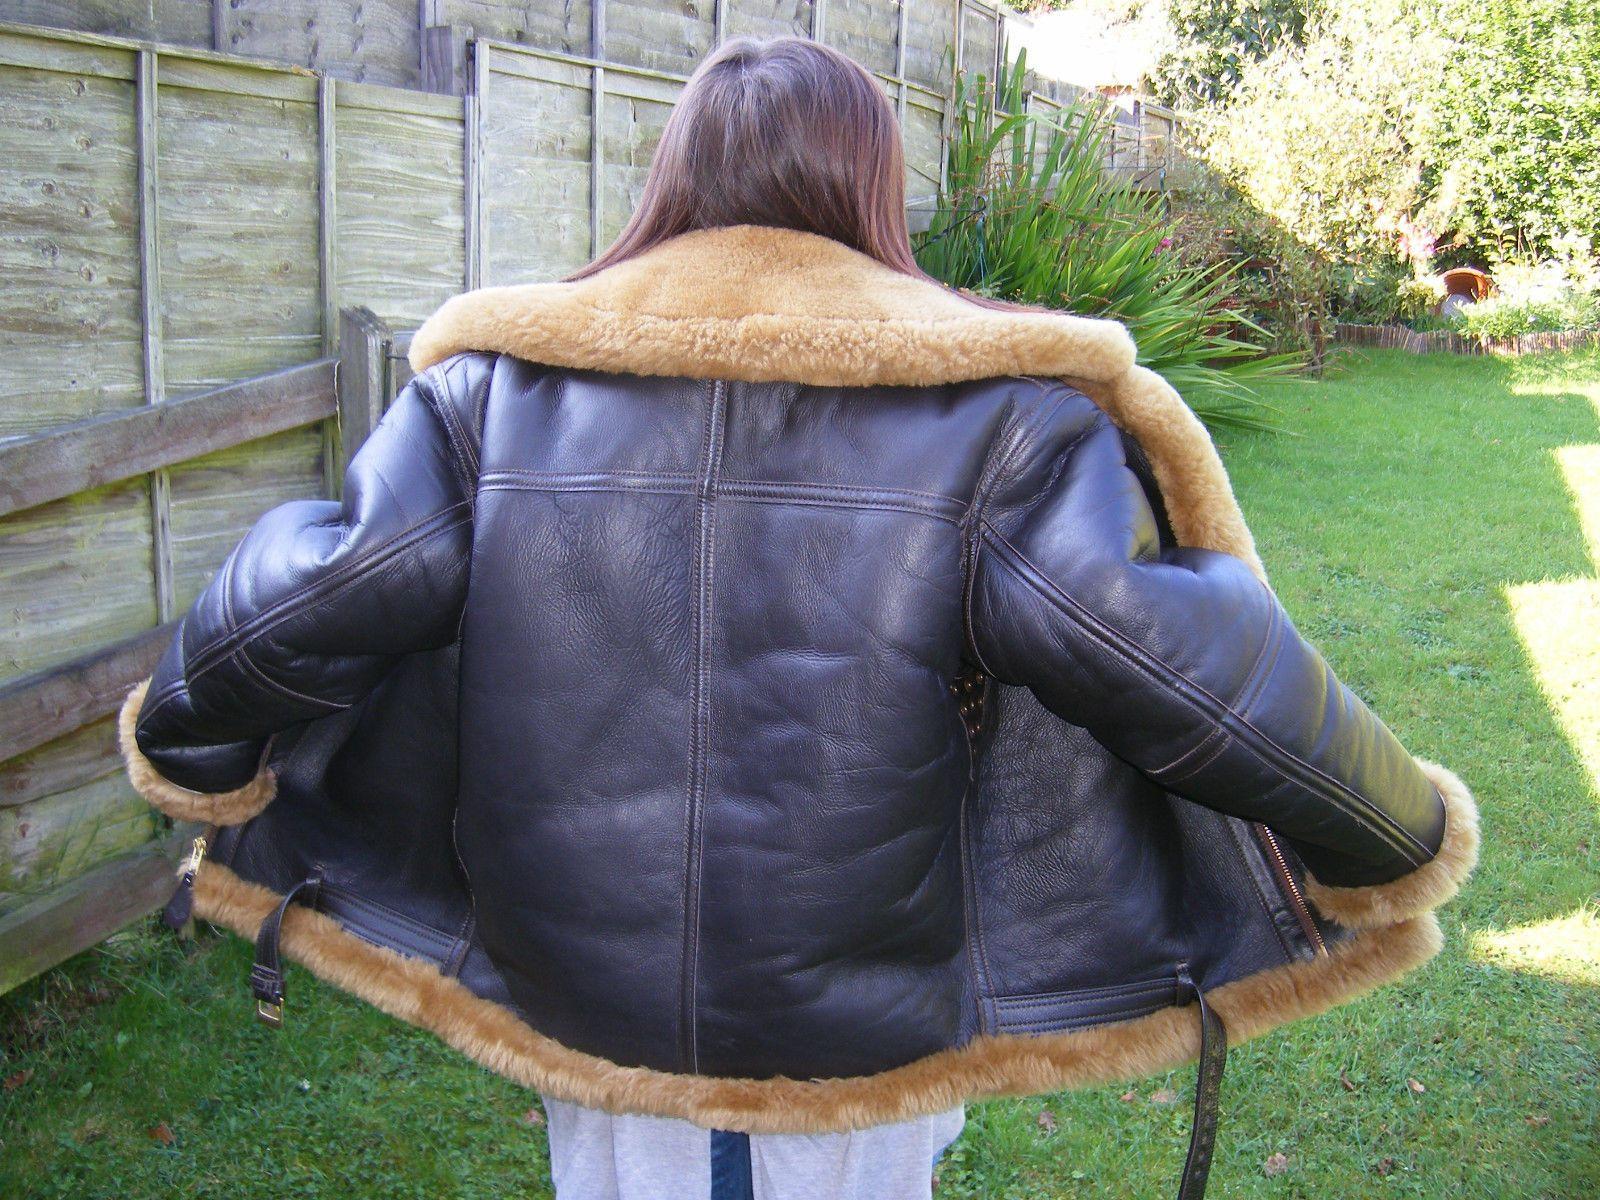 Genuine irvin sheepskin flying jacket seldom worn size 40 mouton genuine irvin sheepskin flying jacket seldom worn size 40 mouton lining ebay gumiabroncs Gallery